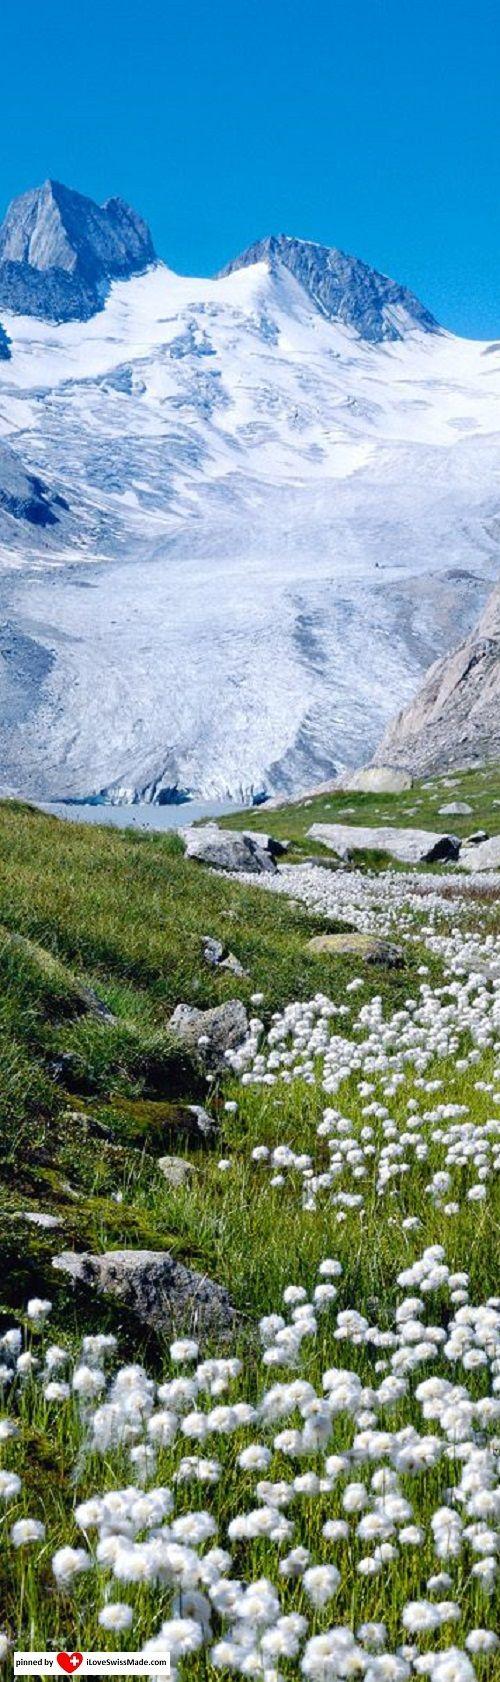 ~Switzerland. Photo Roman Pashkeev (movelands.com) | The House of Beccaria